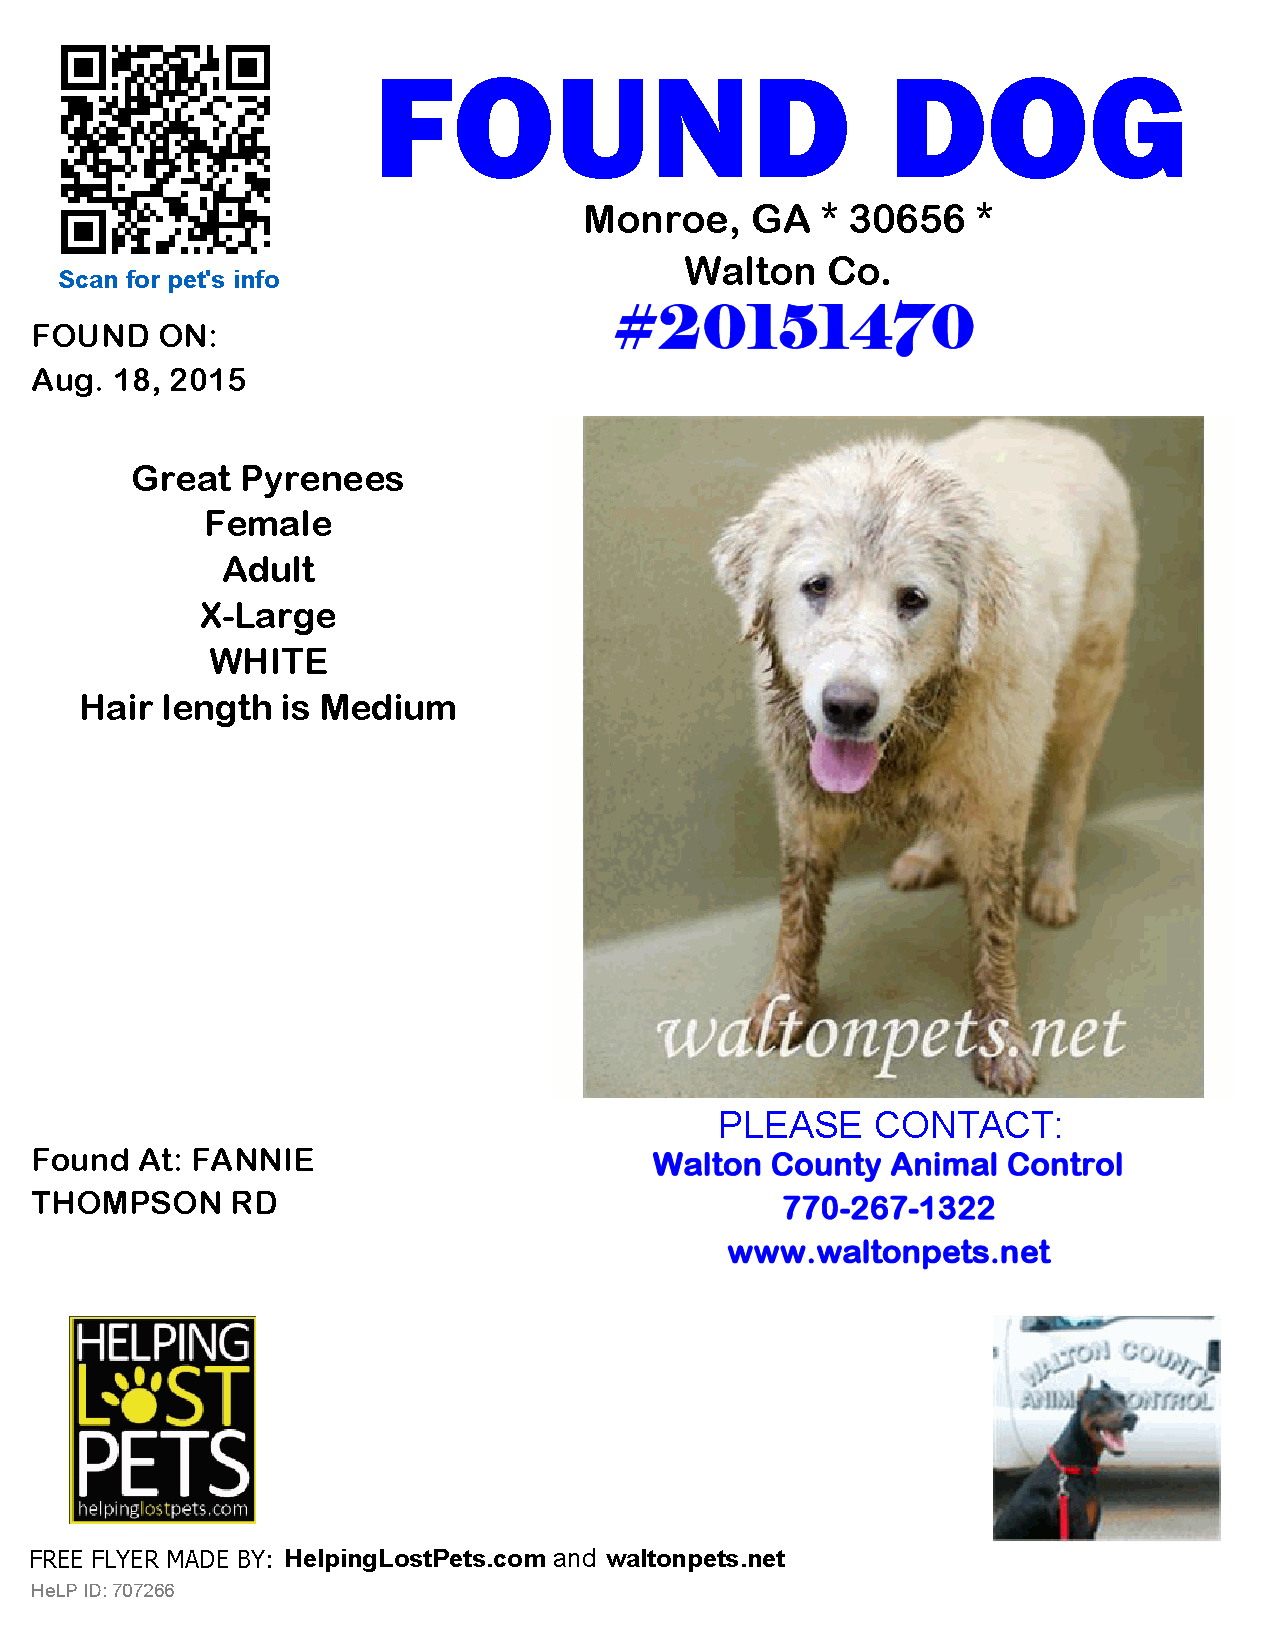 Found Dog Great Pyrenees Monroe GA United States